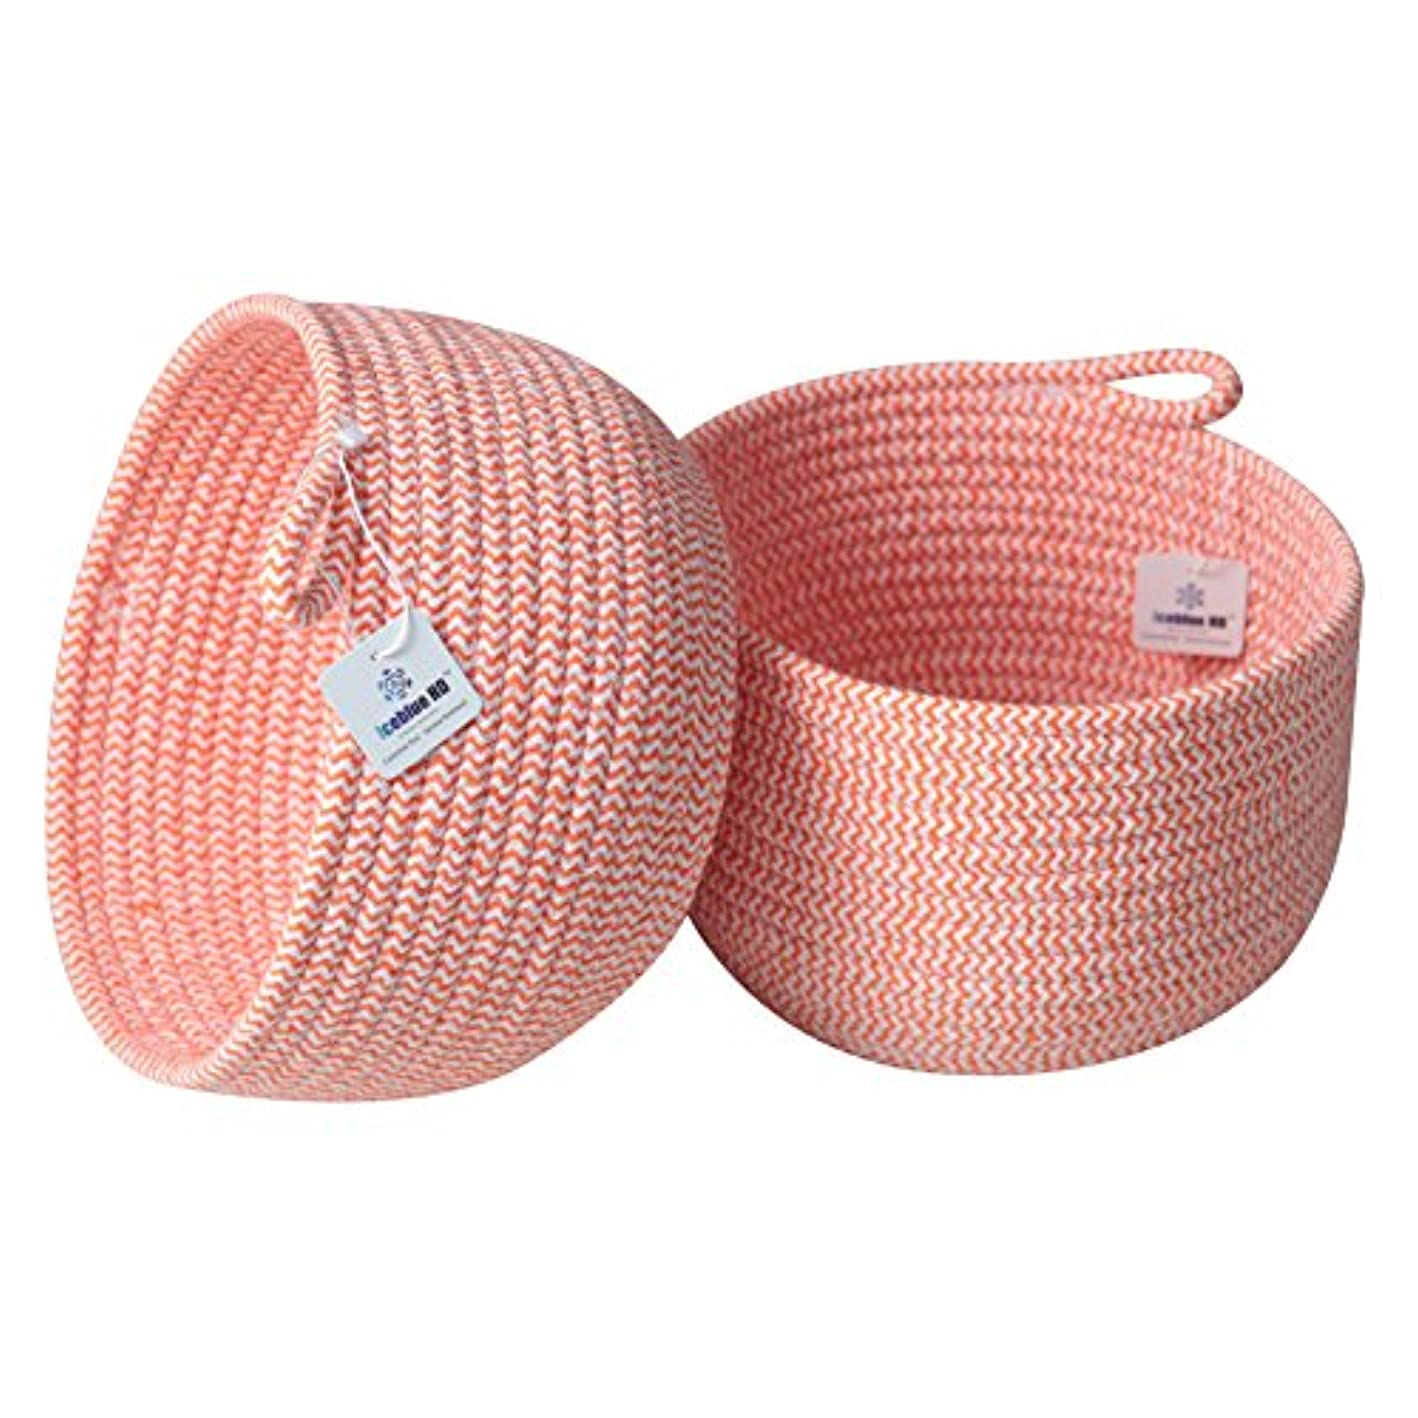 Iceblue Natural 100% Cotton Rope Holiday Storage Basket Candy,Cookie,Flower Basket,Home Decor Storage Box Bins Party,Wedding,Birthday Sets 2